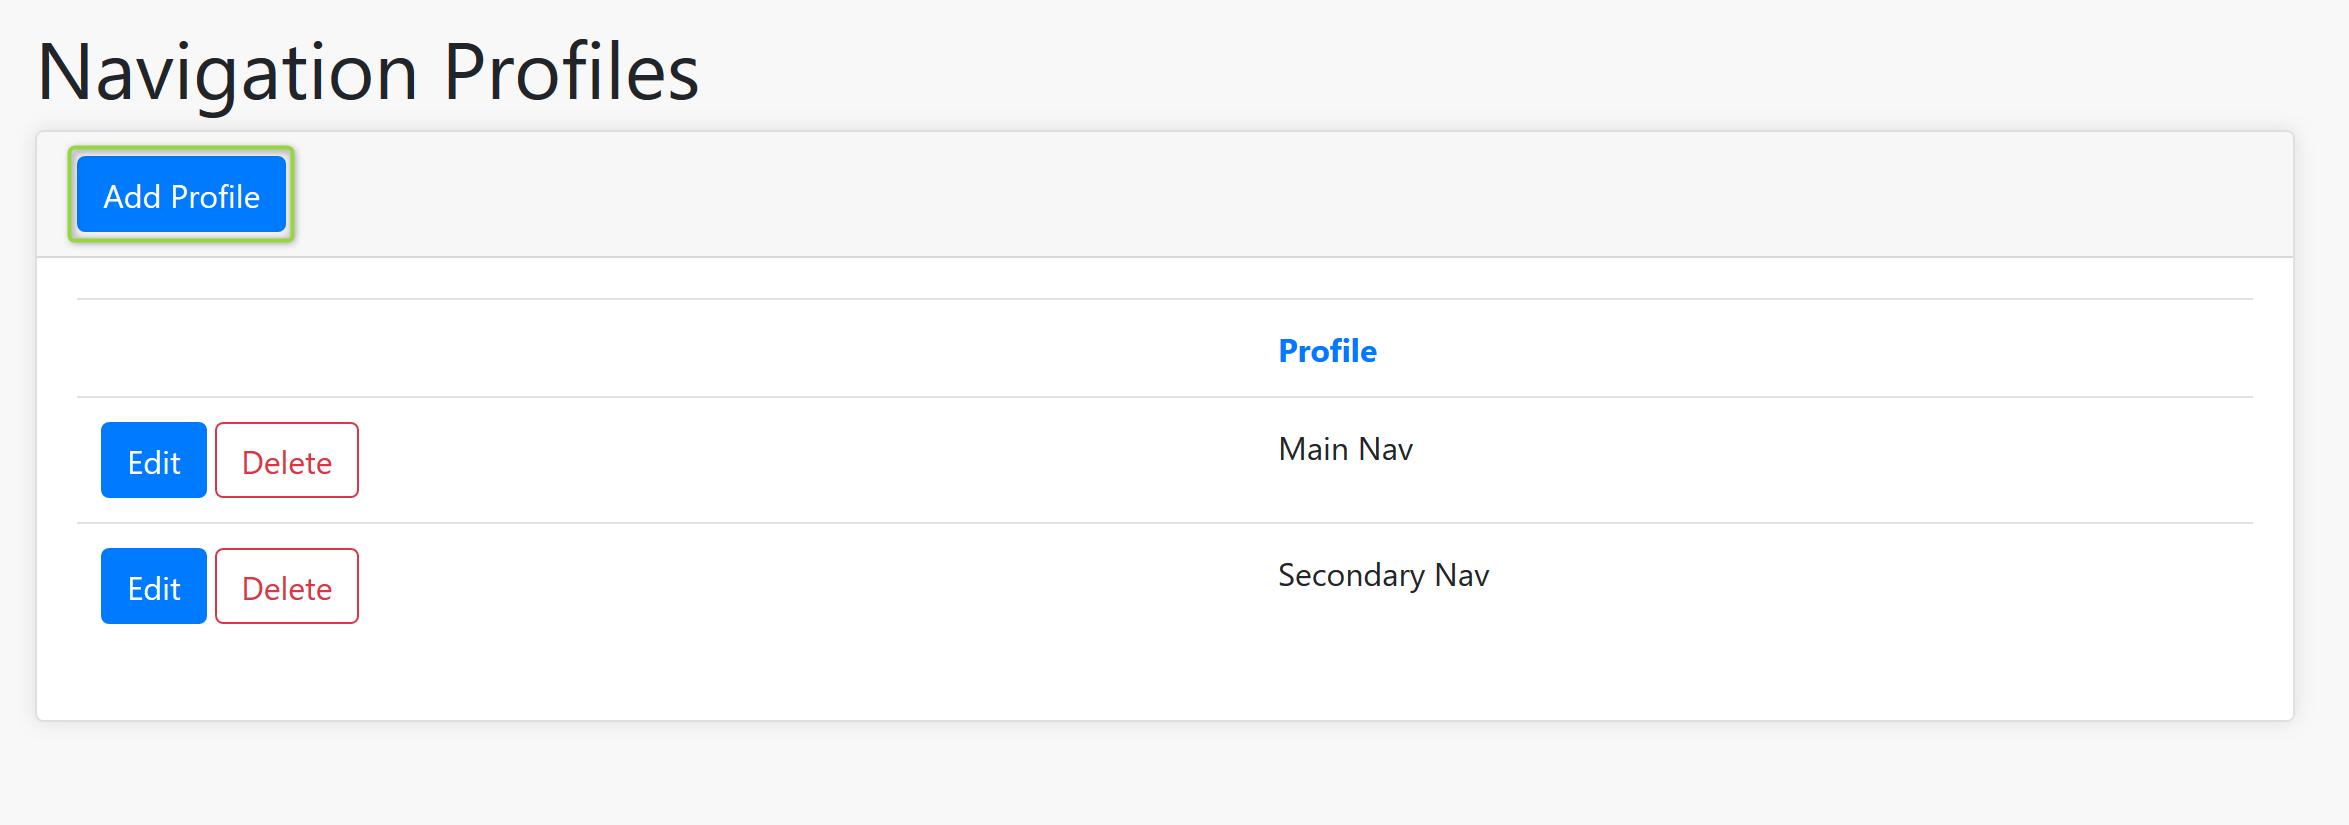 Navigation Profiles Screenshot